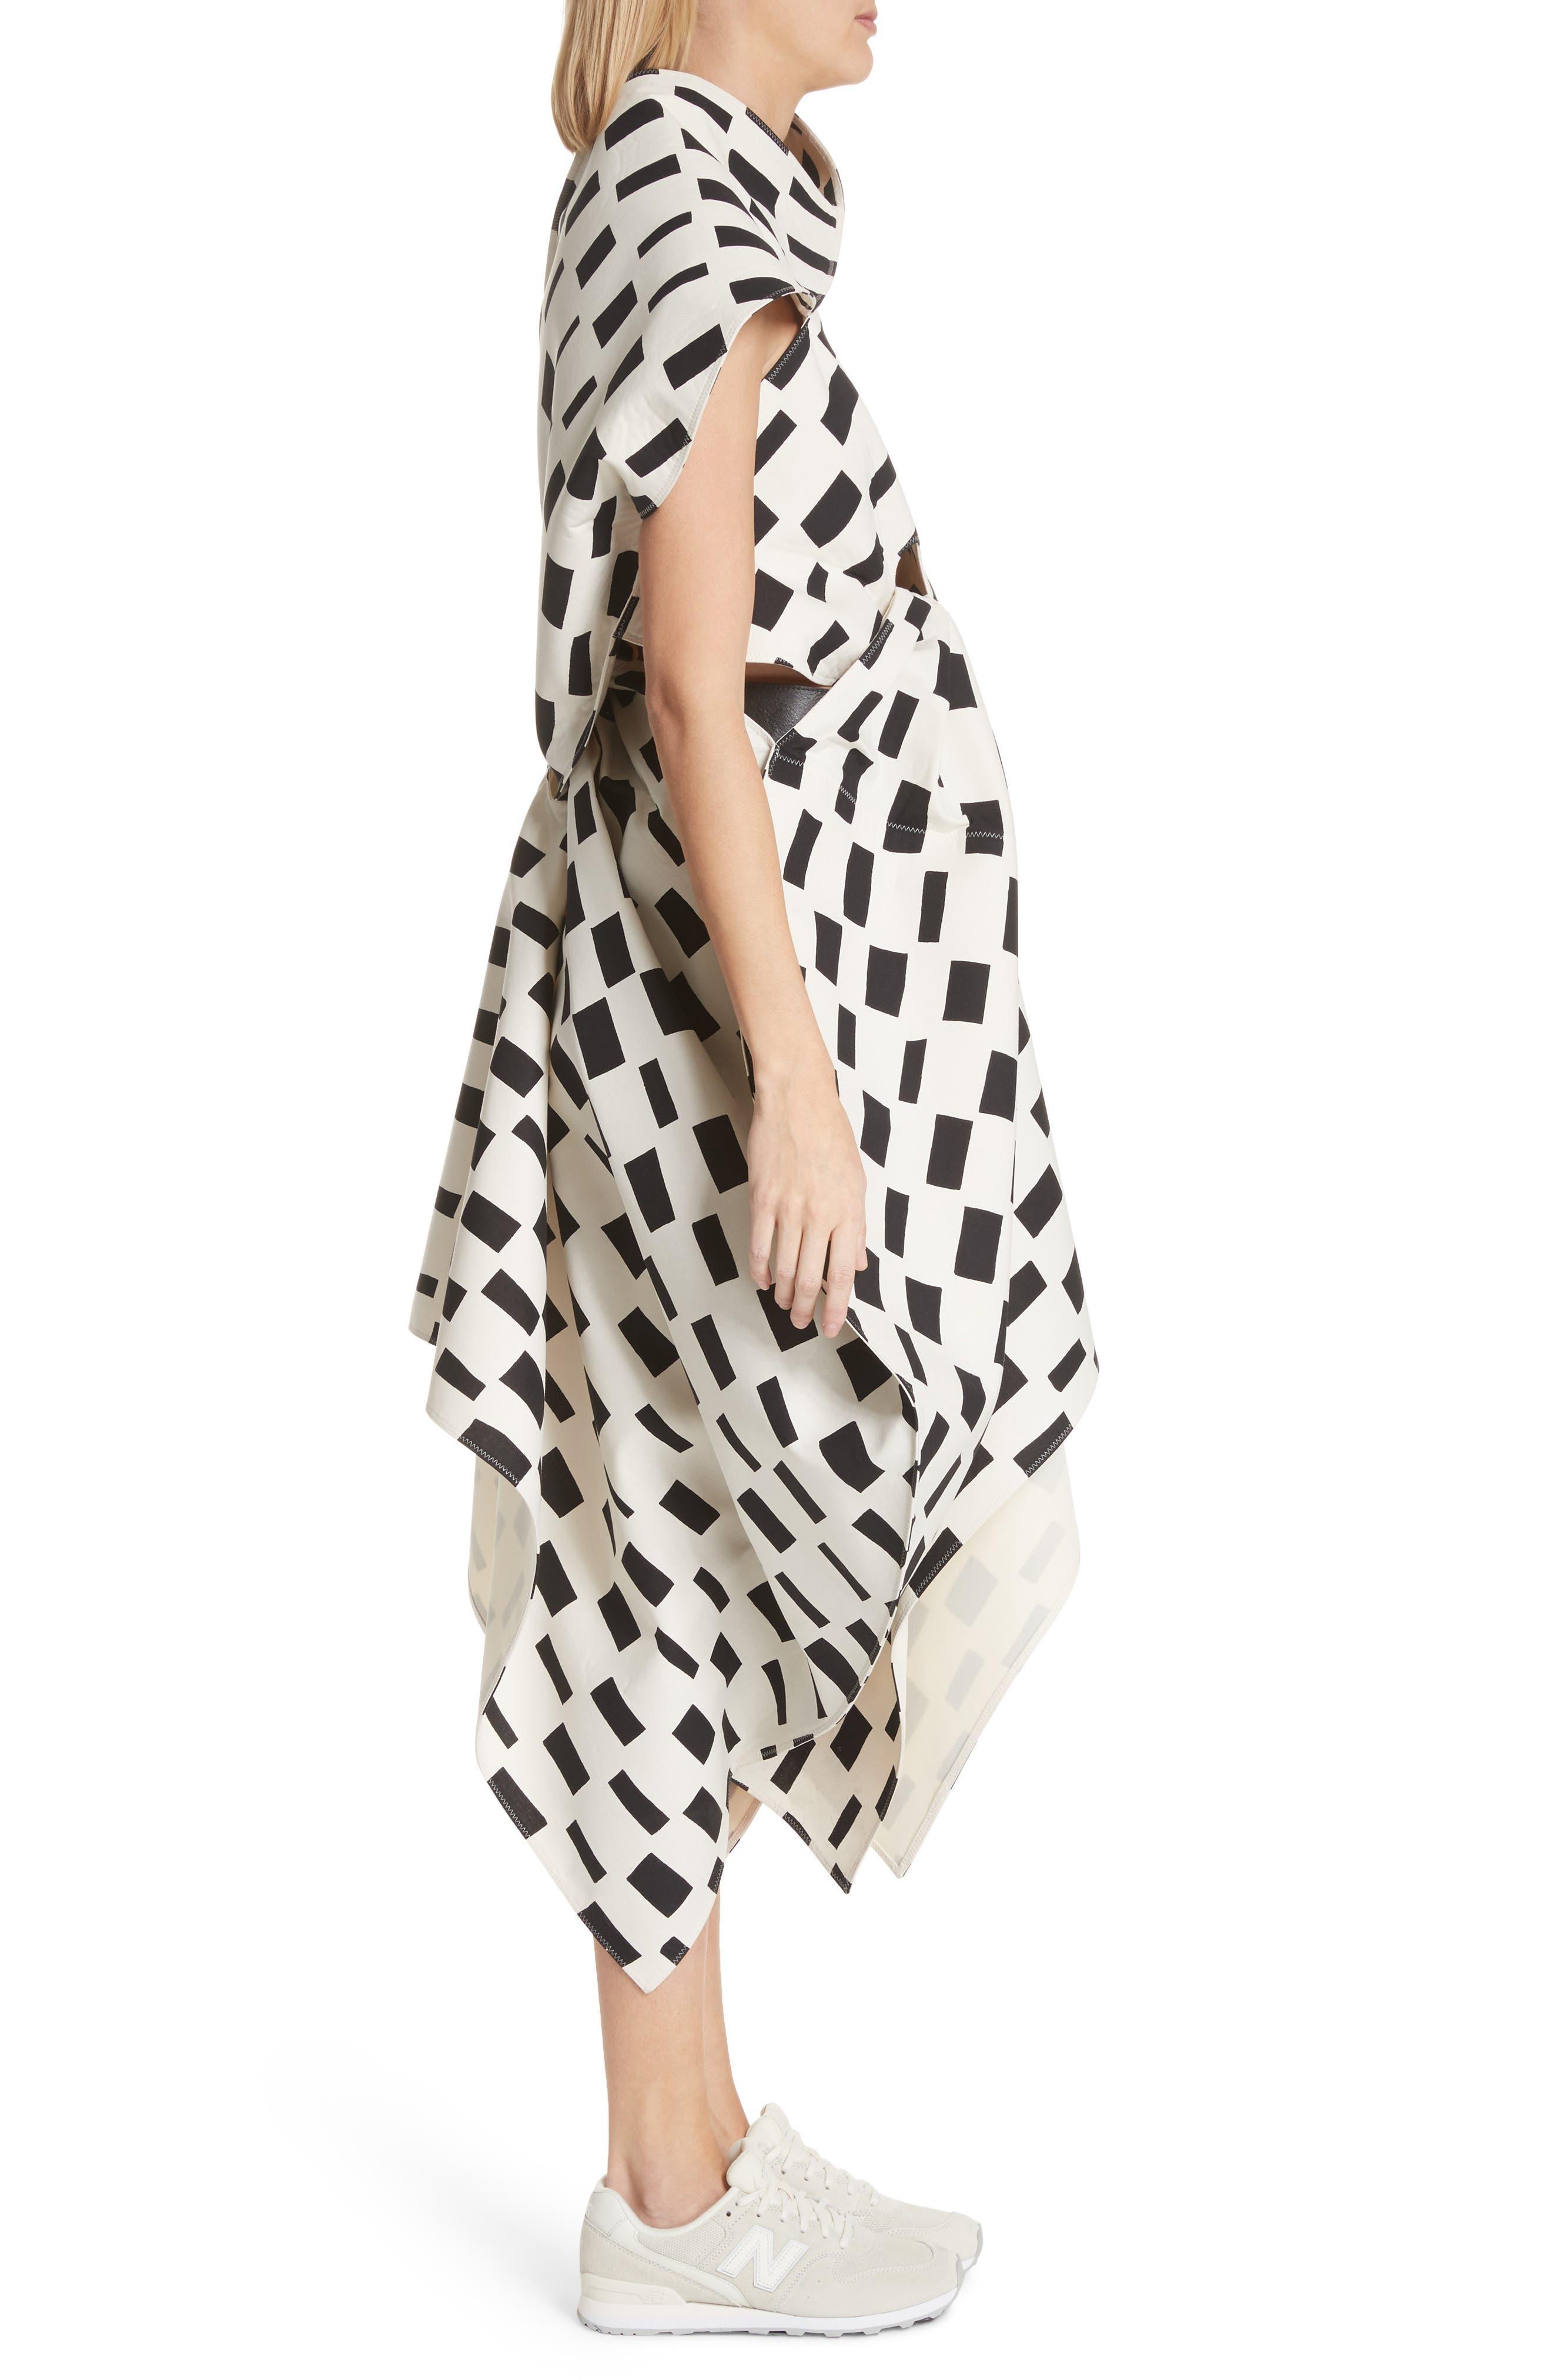 Interweave Geo Print Dress,                             Alternate thumbnail 3, color,                             Off White/ Black